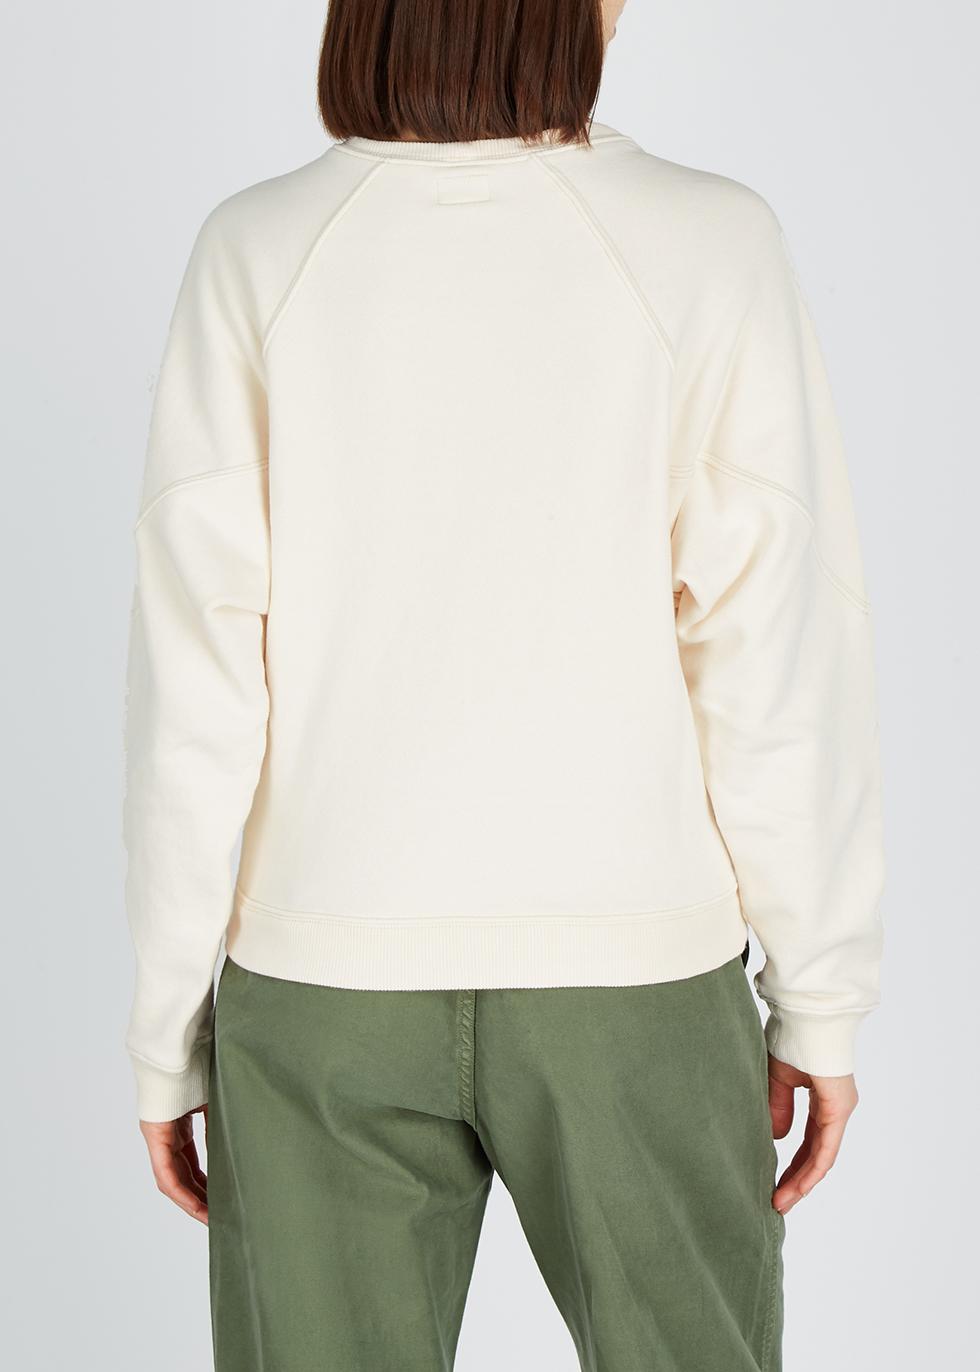 Lina cream cotton sweatshirt - Citizens of Humanity